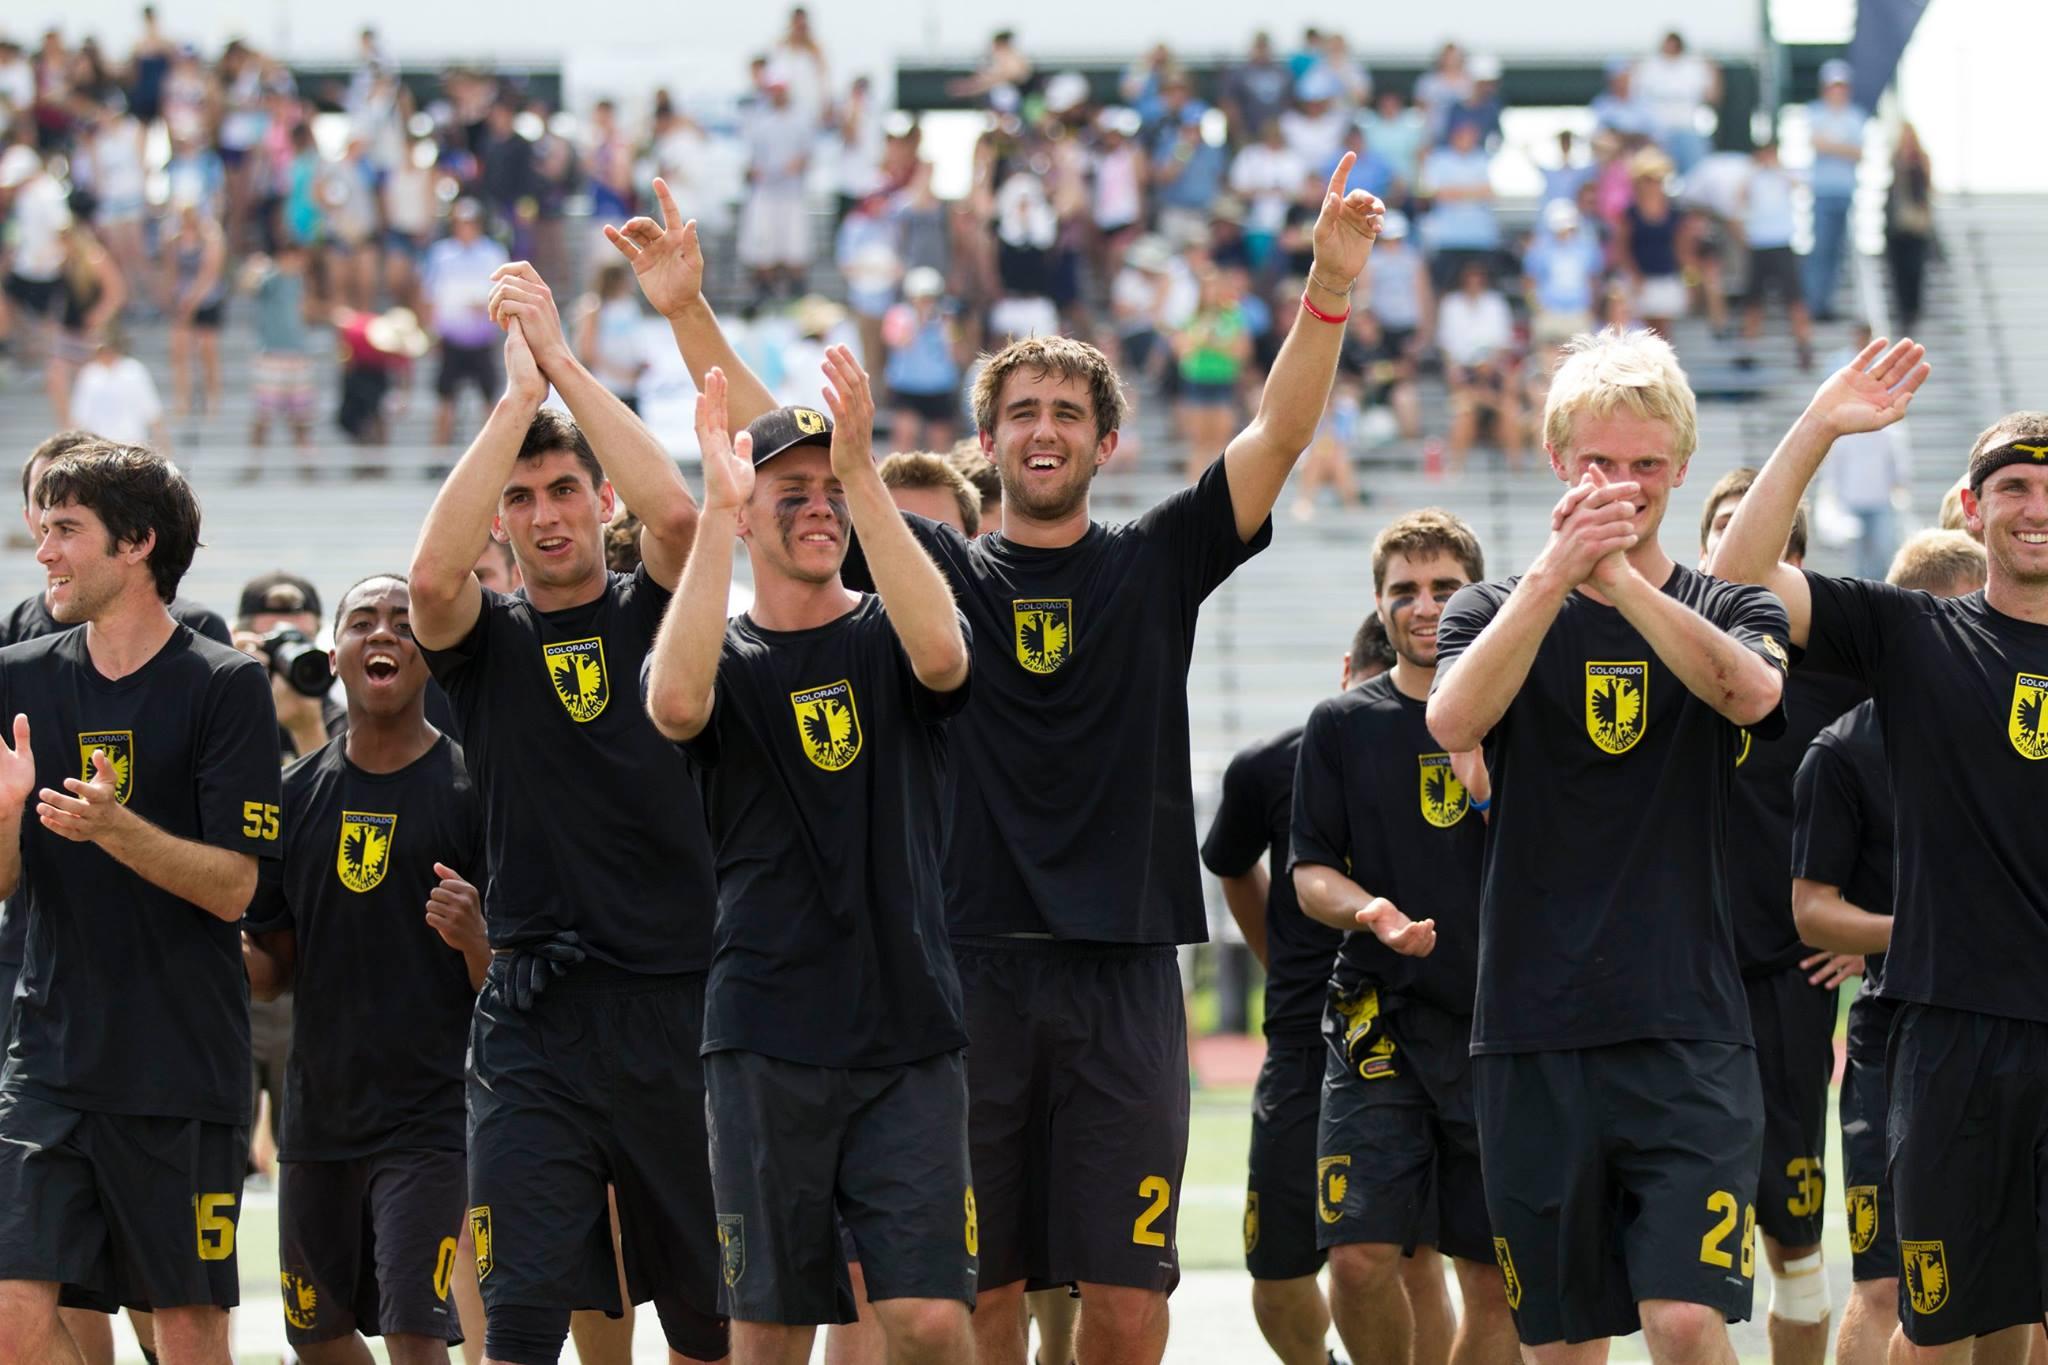 Colorado Mamabird celebrates winning their 2014 College Championship